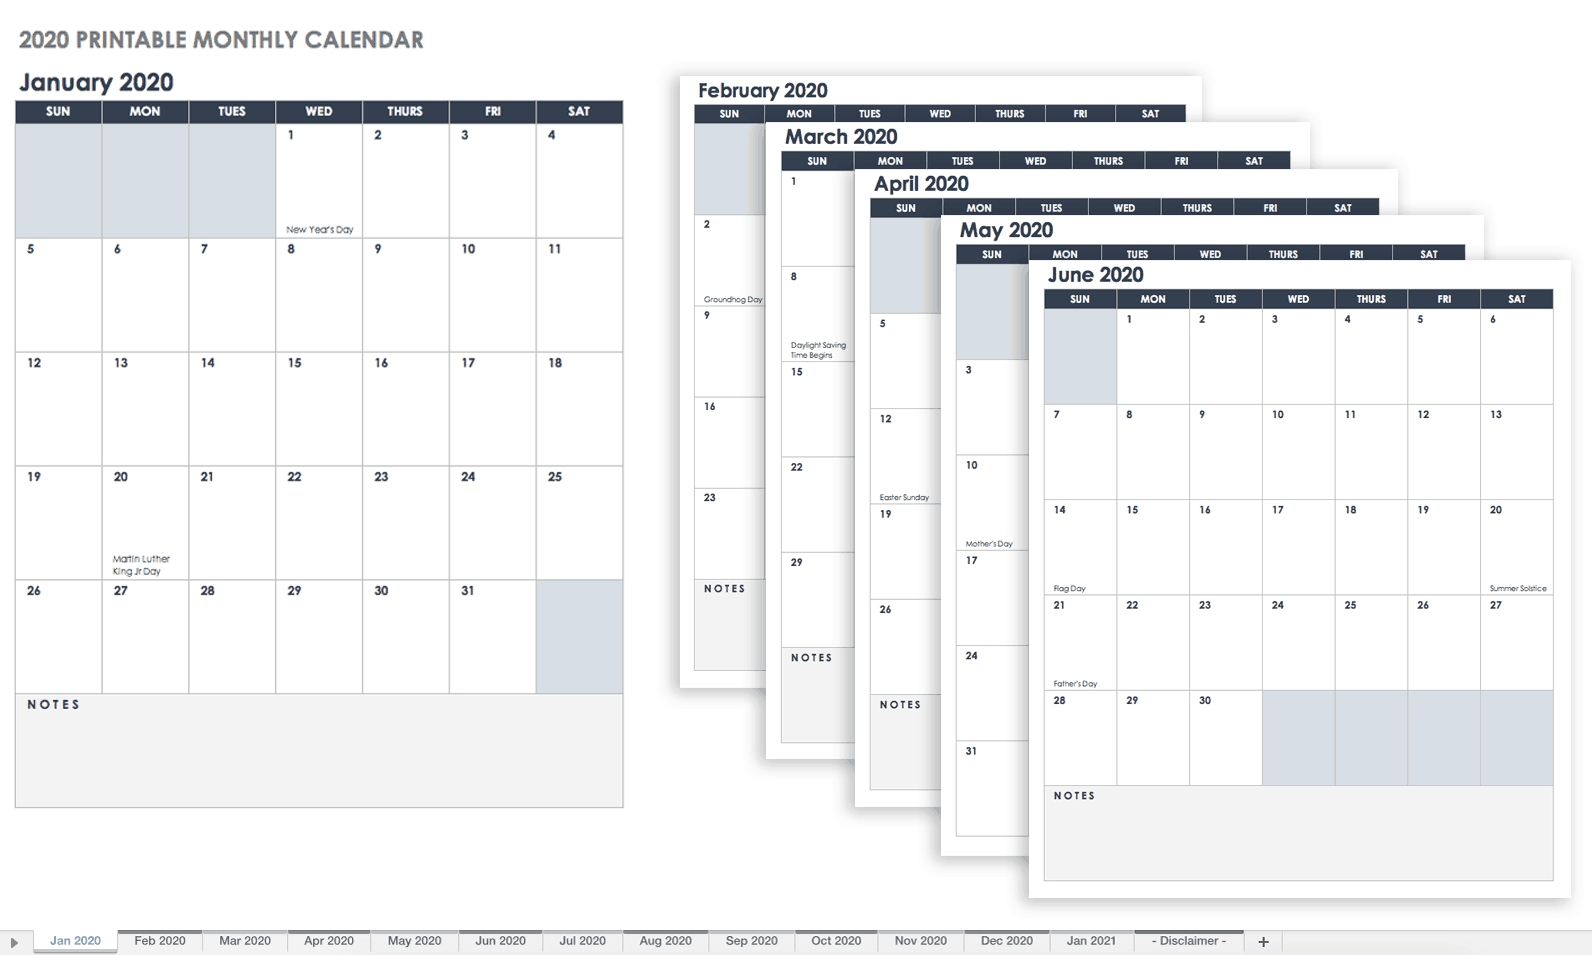 Free Blank Calendar Templates - Smartsheet-Printable Monthly Calendar Grid